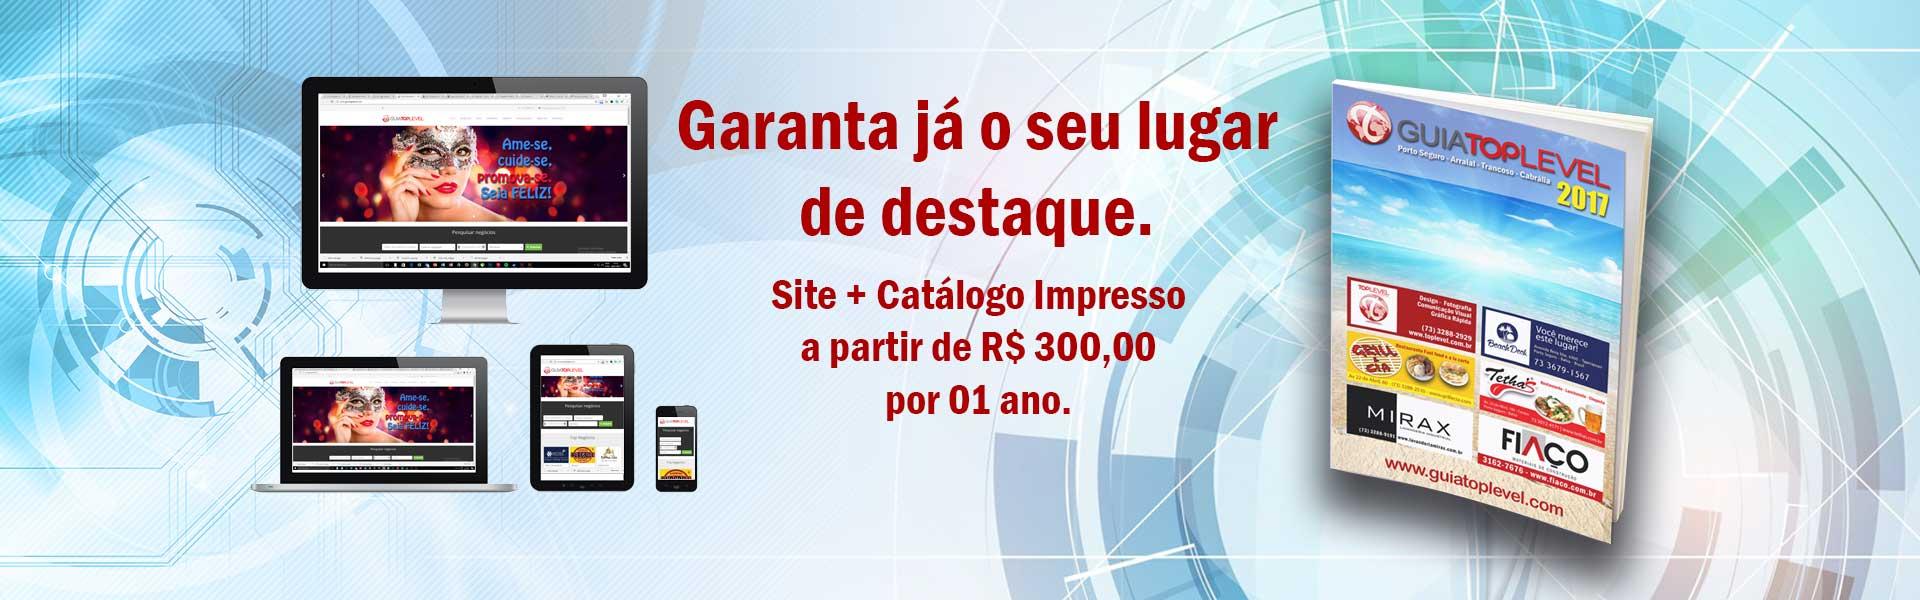 site_catalogo